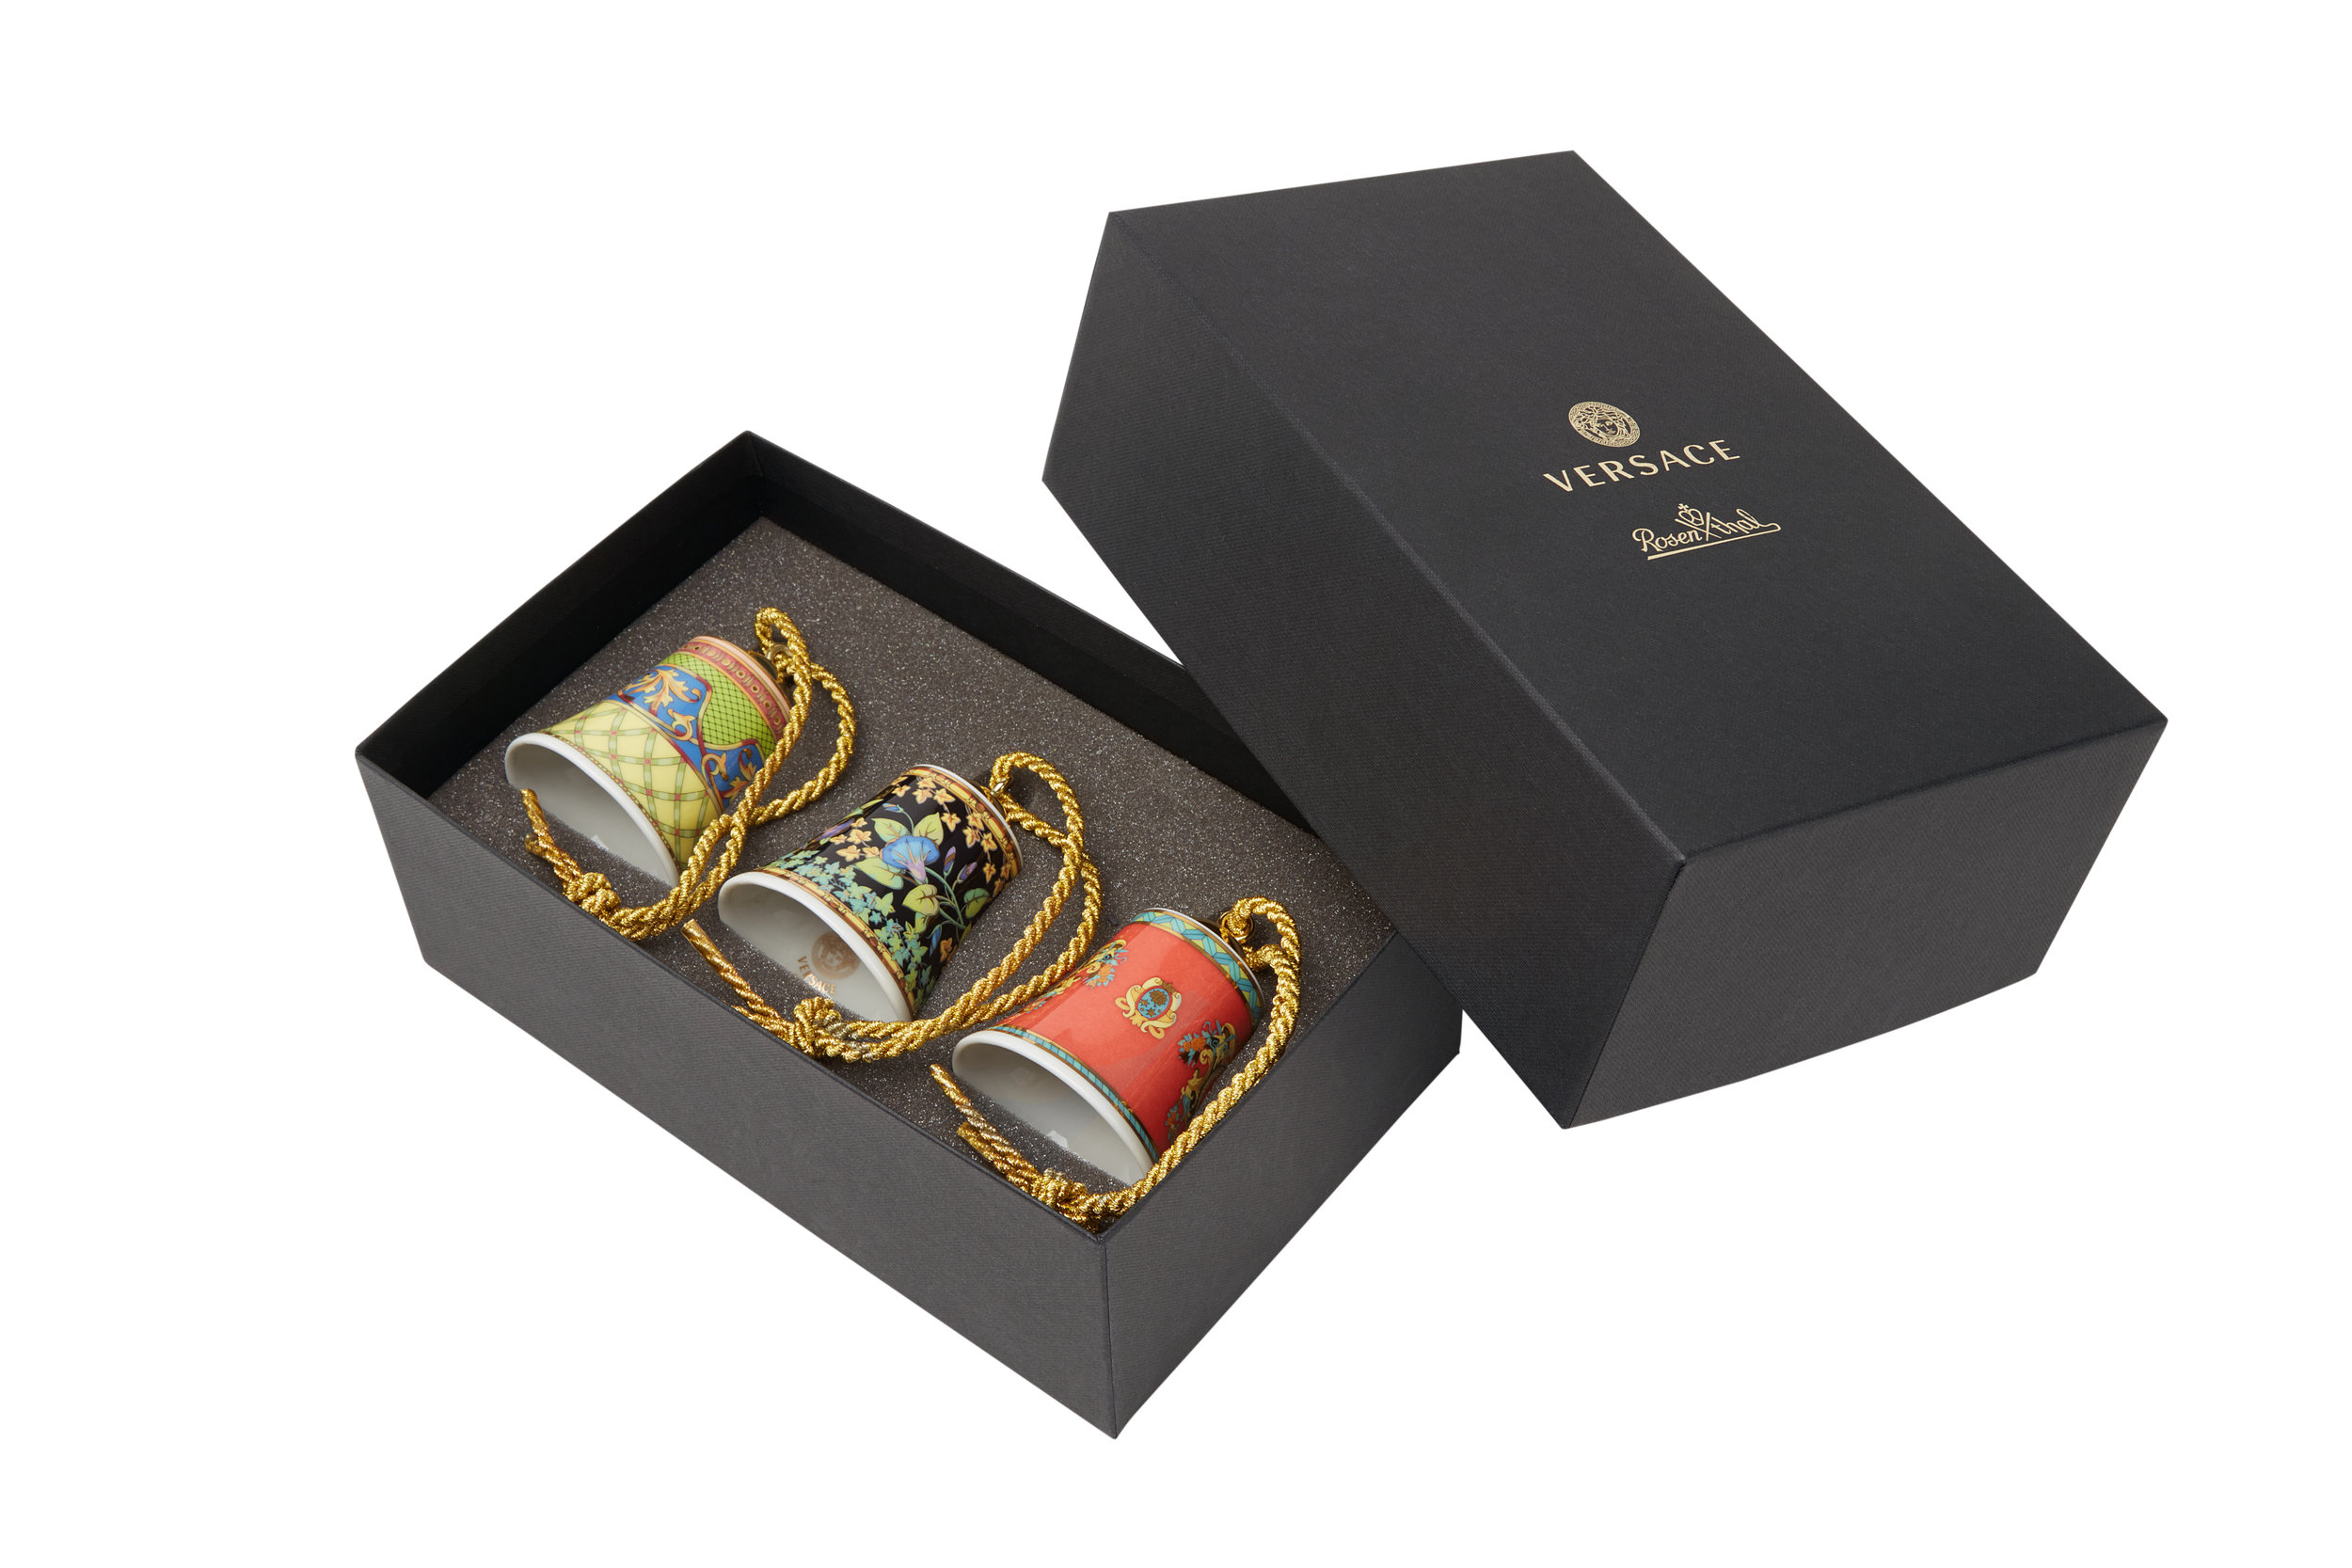 Versace Collectible Coffret.jpg